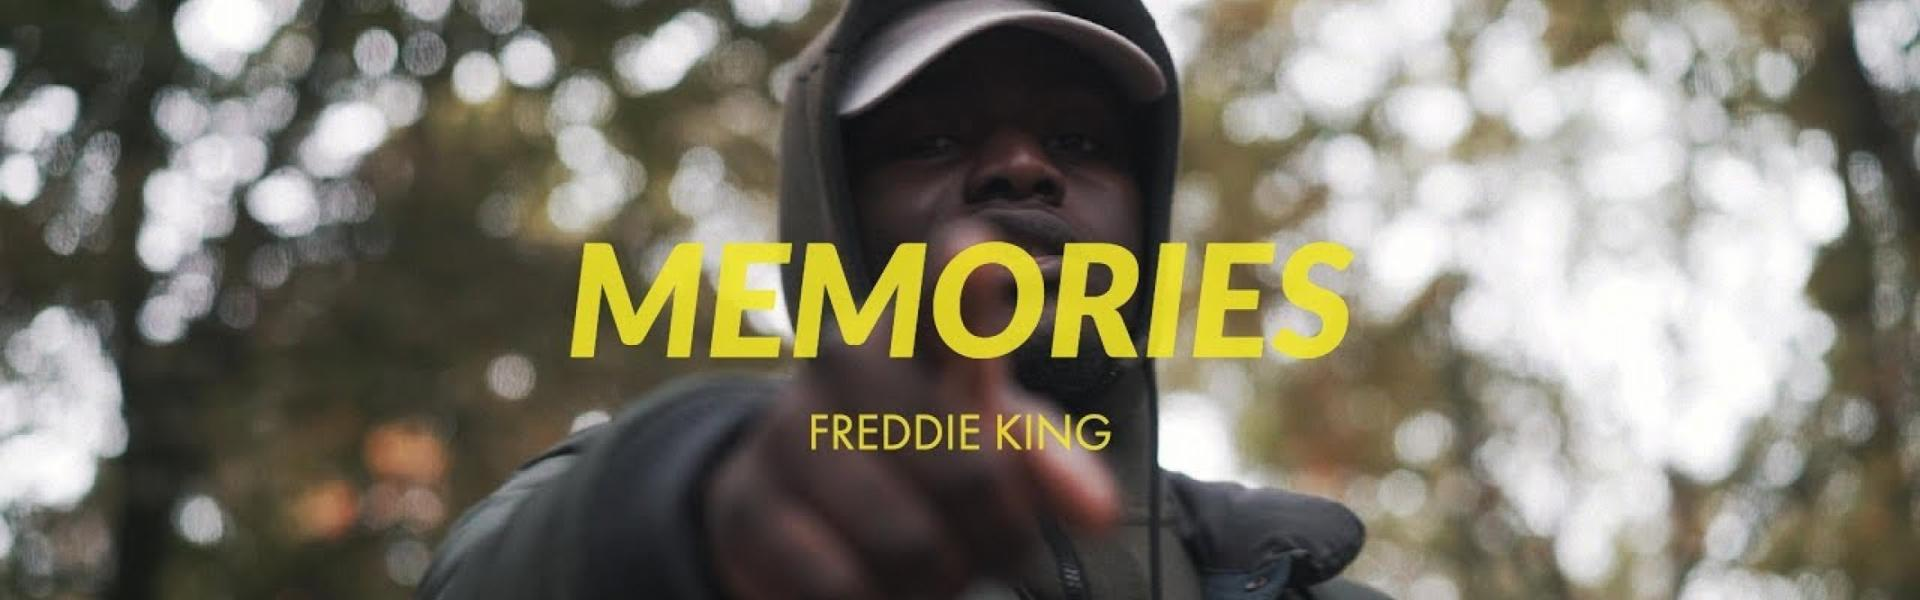 Embedded thumbnail for Freddie King - Memories